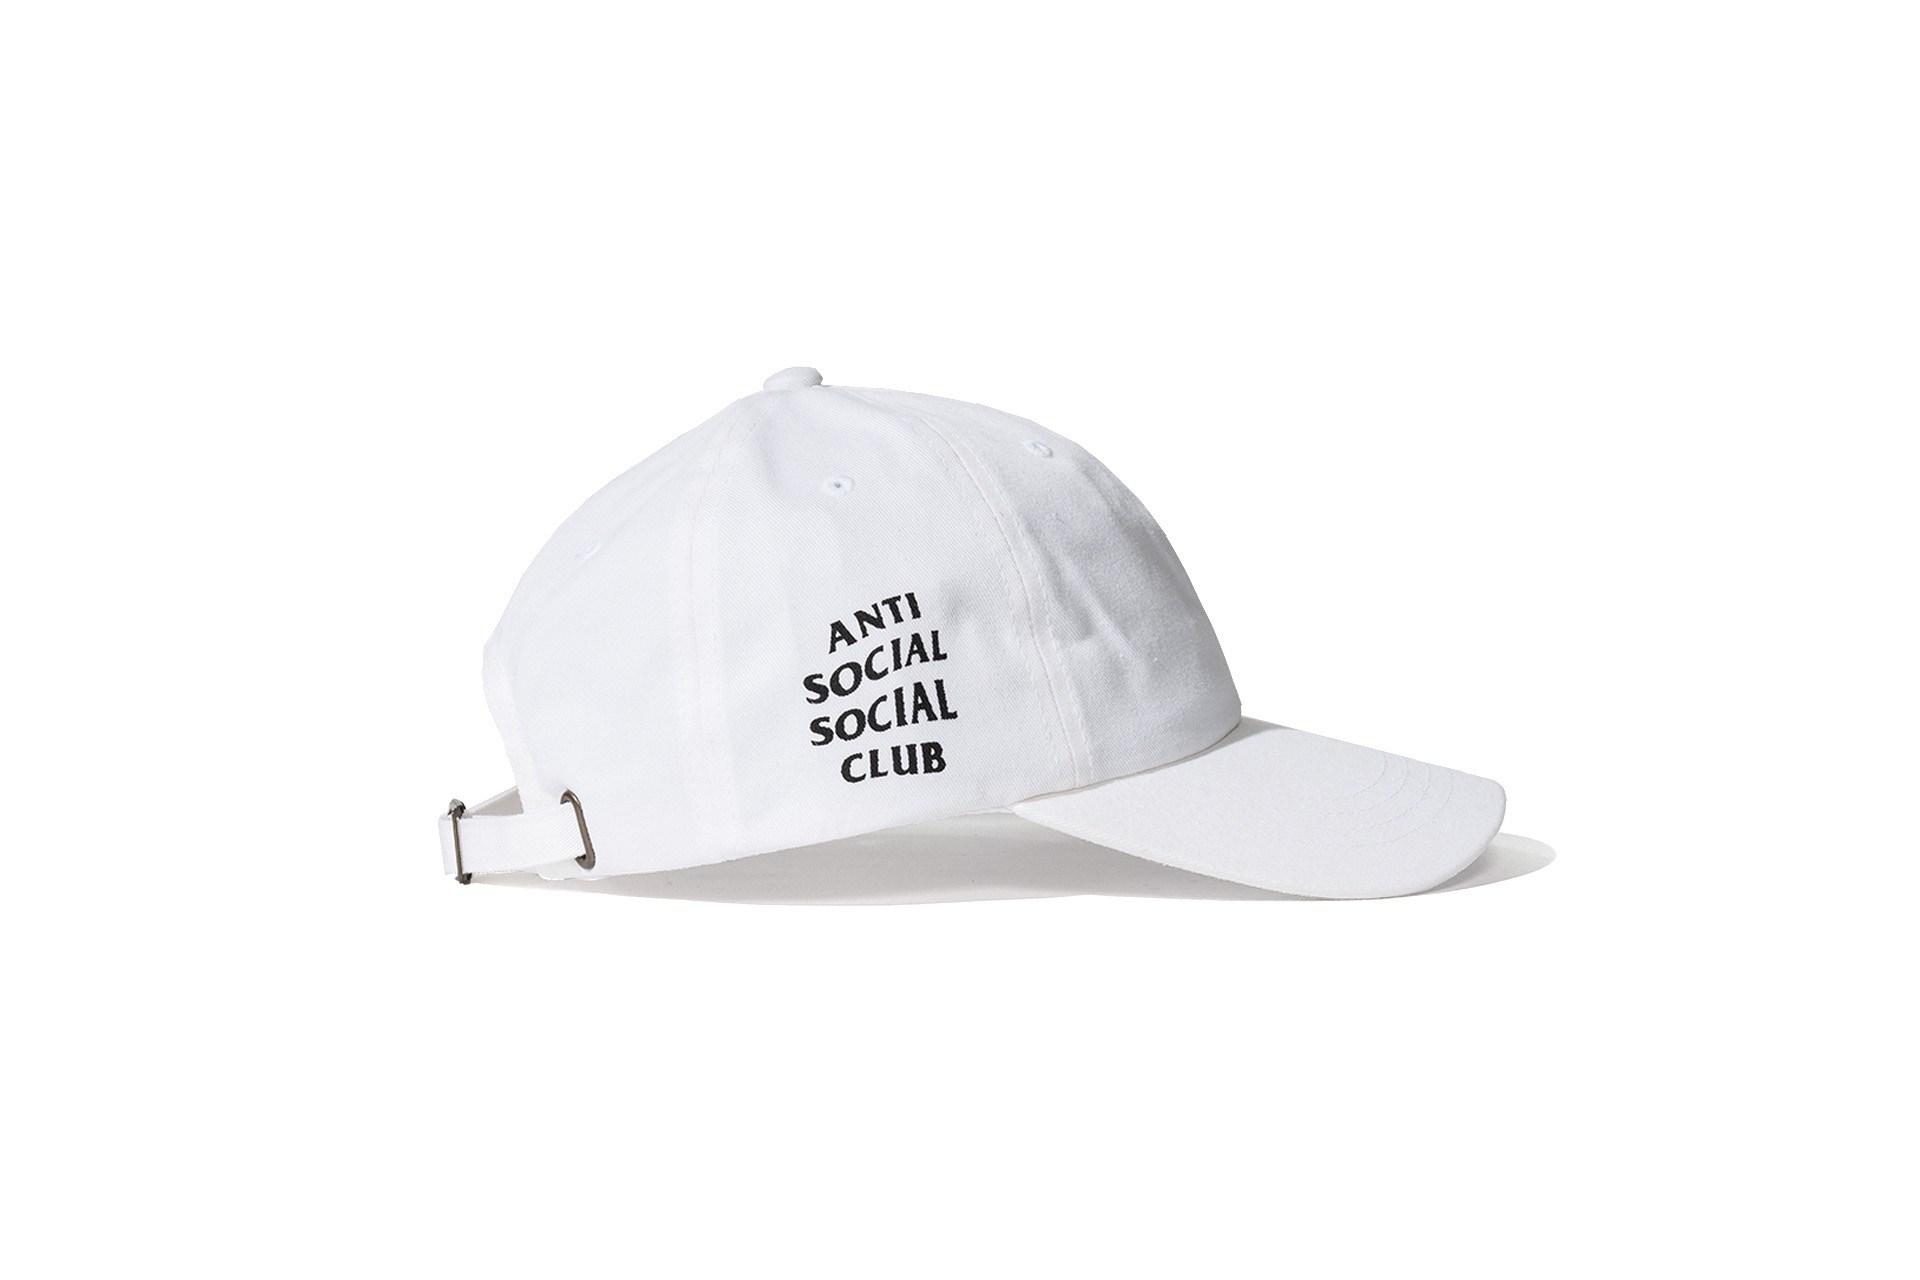 anti-social-social-club-collection-2017-spring-summer-64